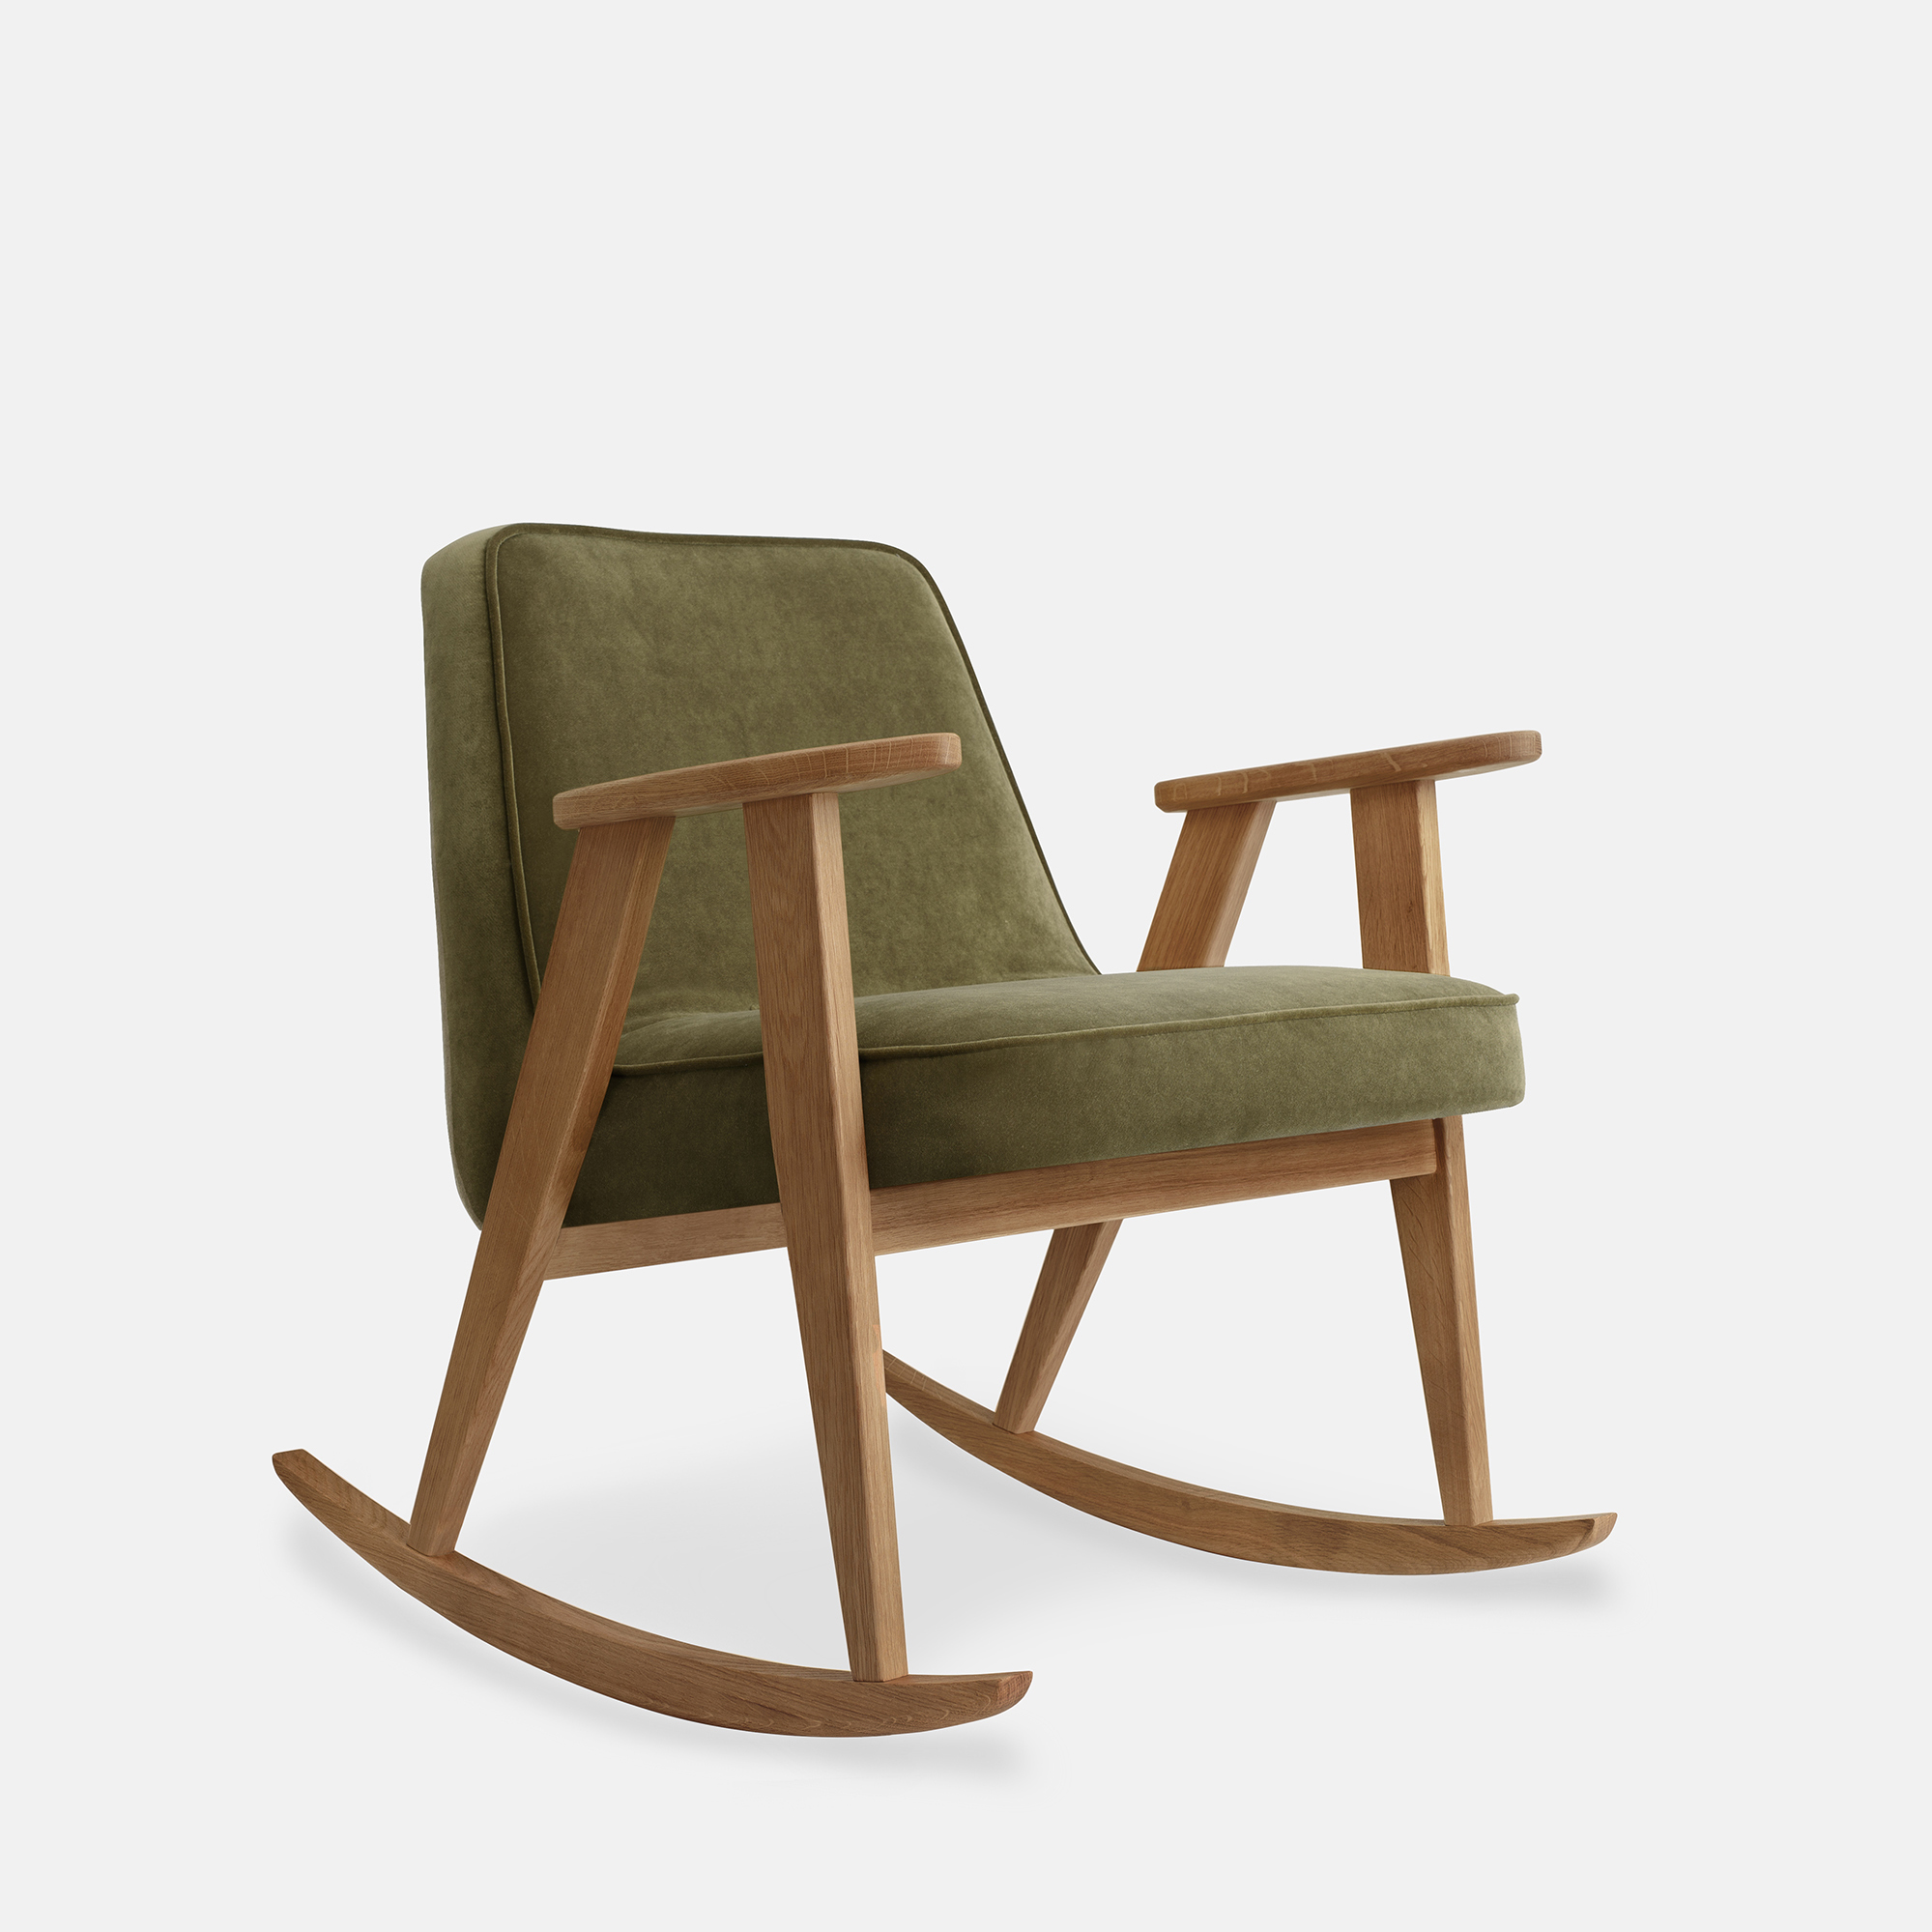 366-Concept-366-Rocking-Chair-W02-Velvet-Olive